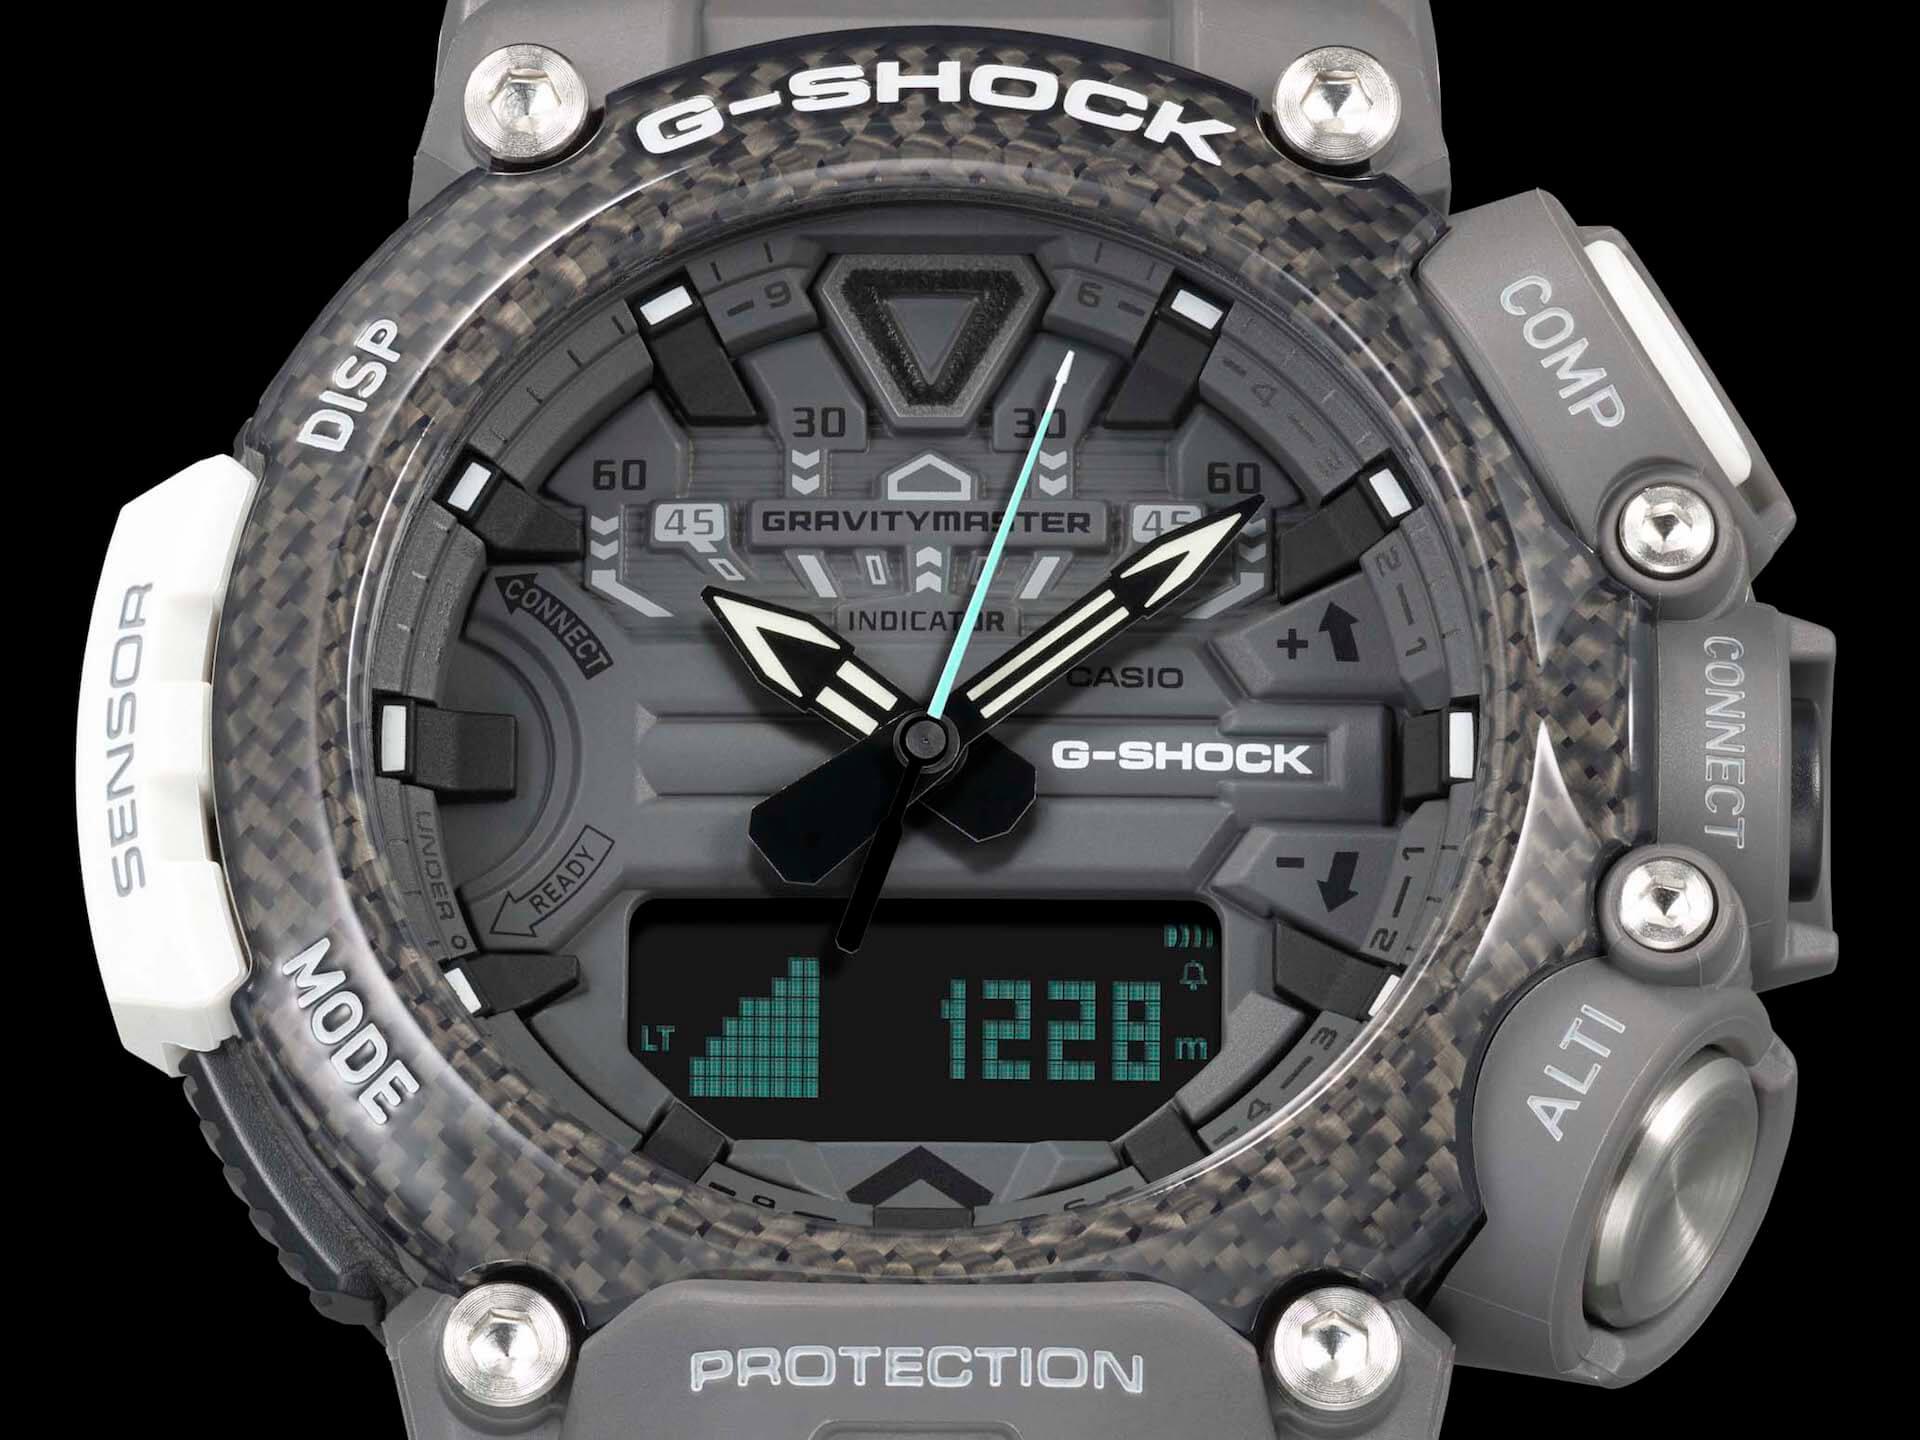 G-SHOCKのアビエーションウオッチシリーズ「GR-B200」と世界最古の空軍ROYAL AIR FORCEのコラボモデルが誕生! tech201015_g_shock_17